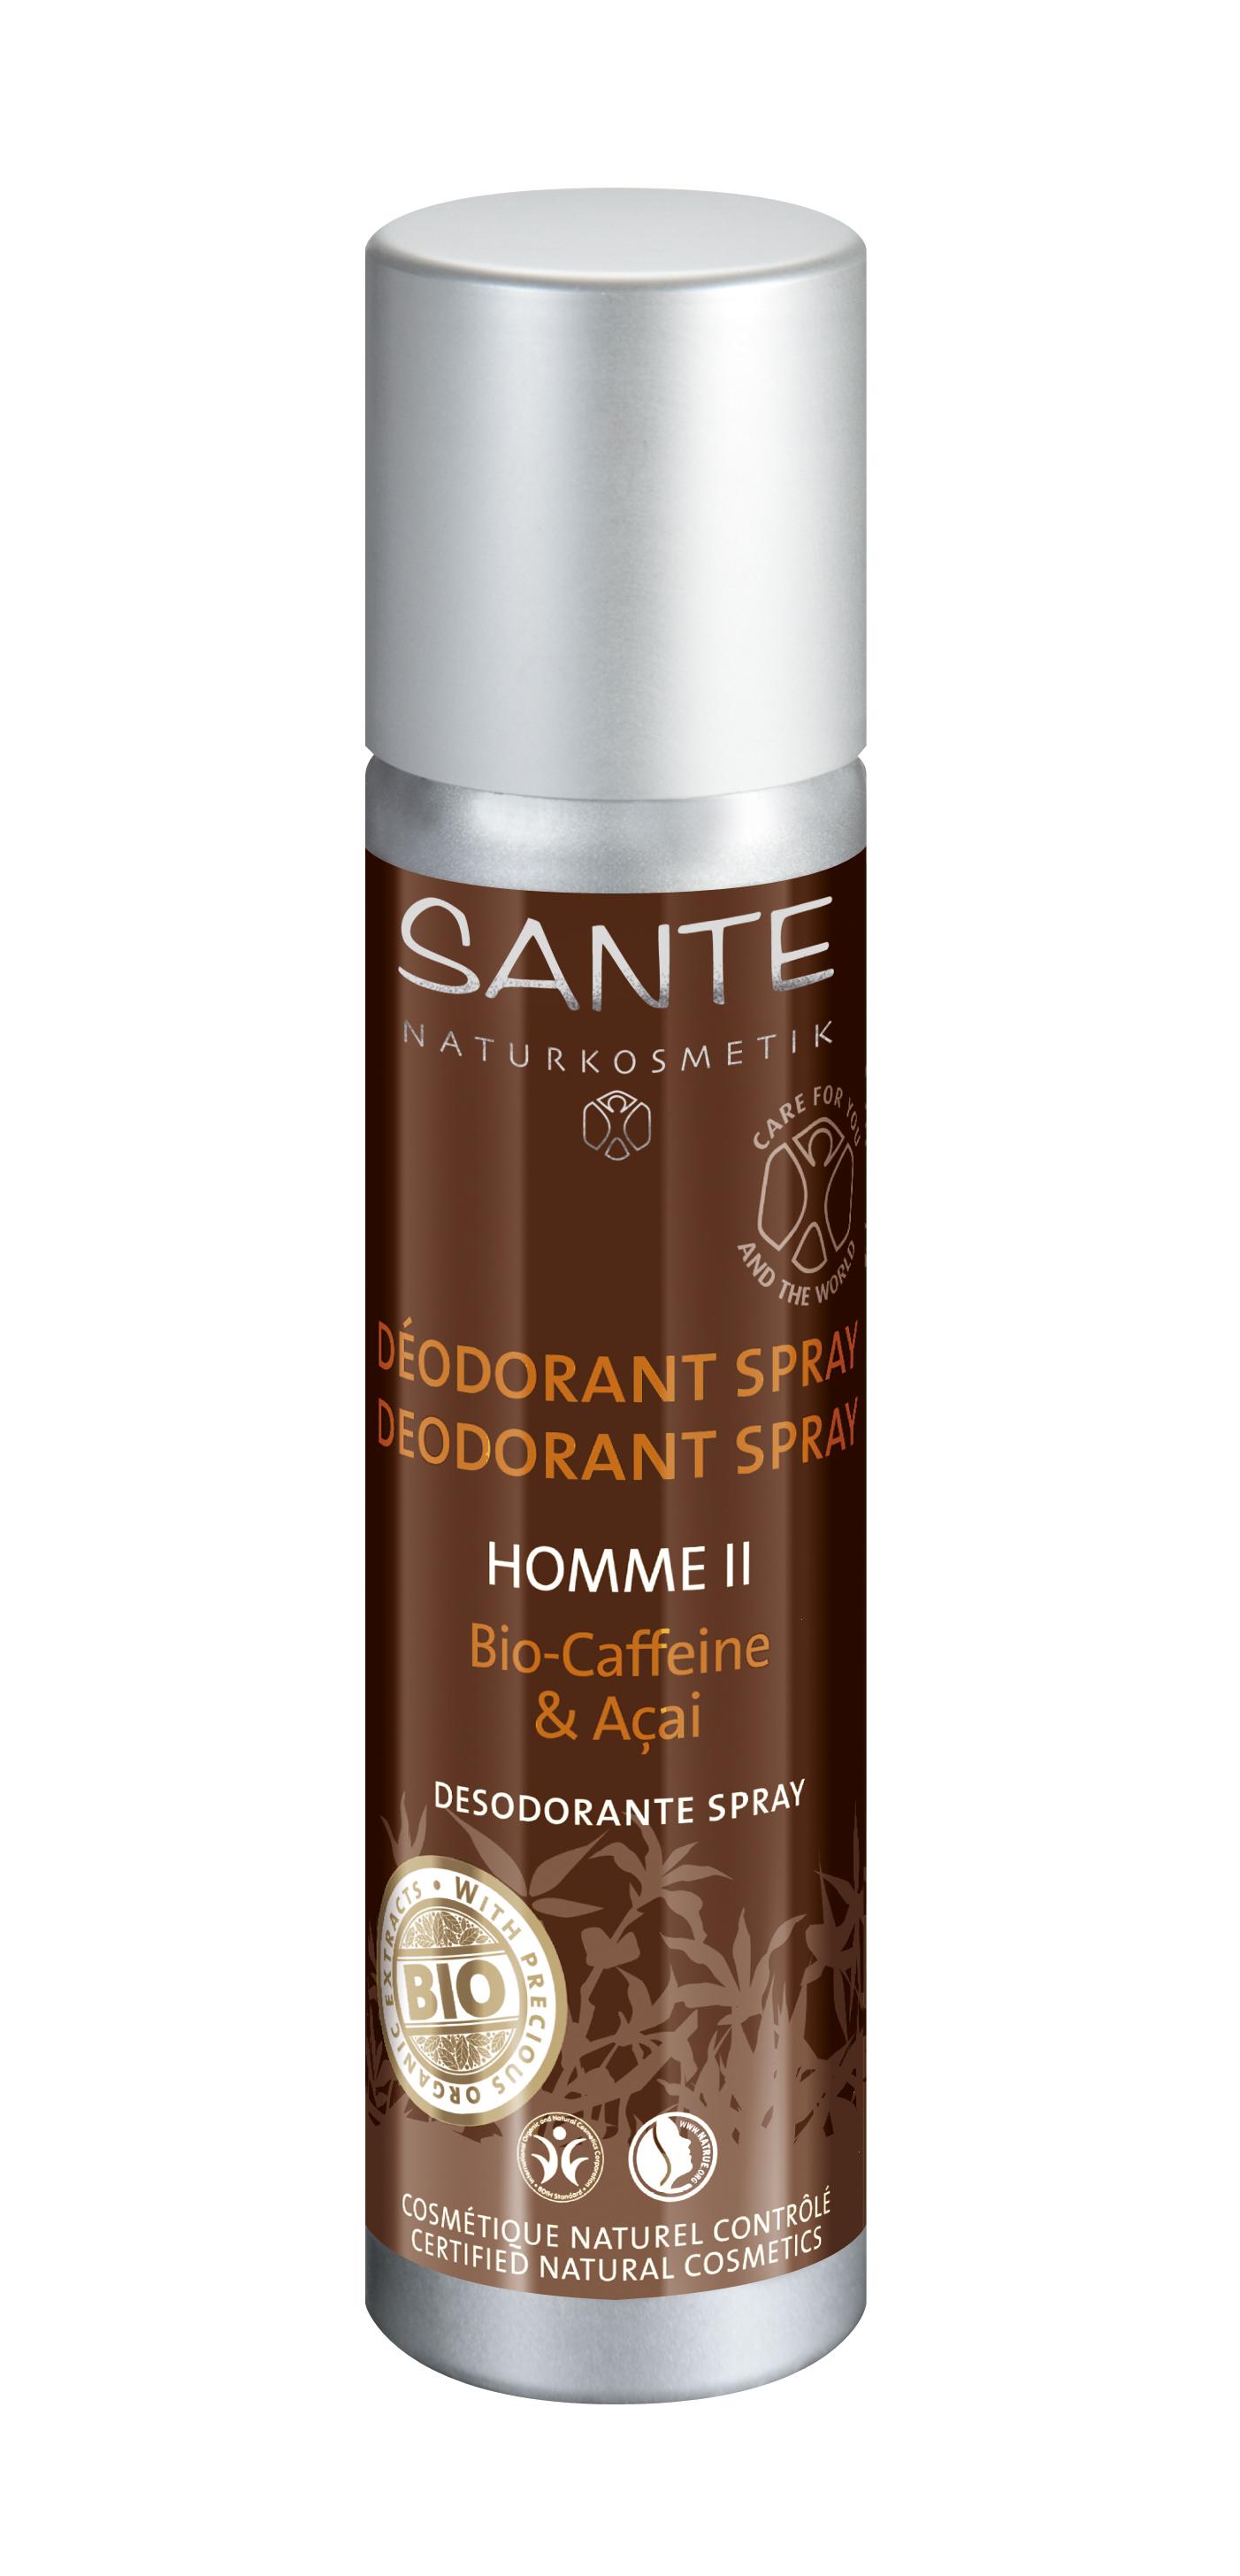 Homme II deodorant-sprei Sante, 100 ml